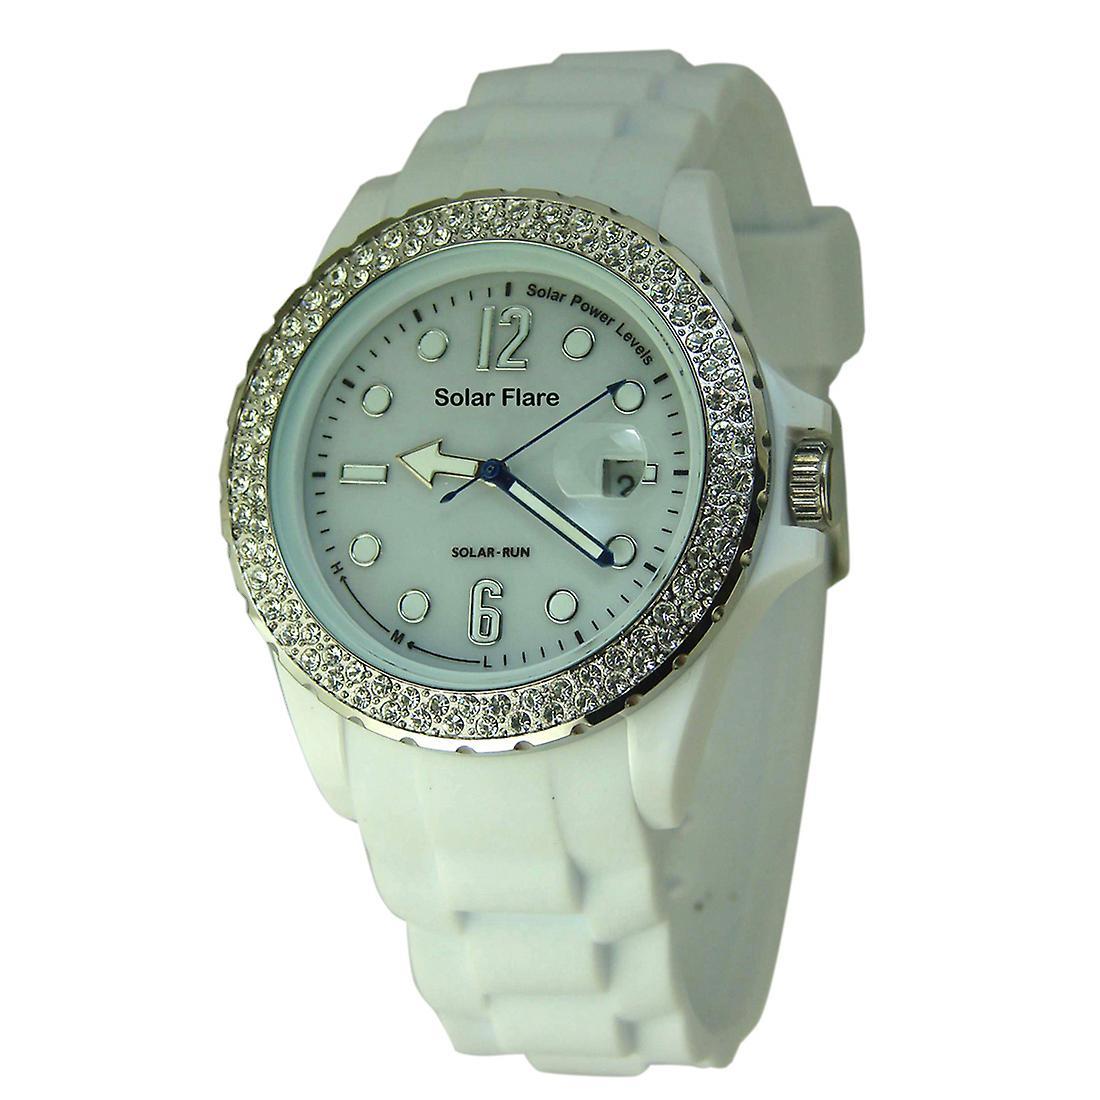 Solar Flare Watch - White - Jewelled Bezel